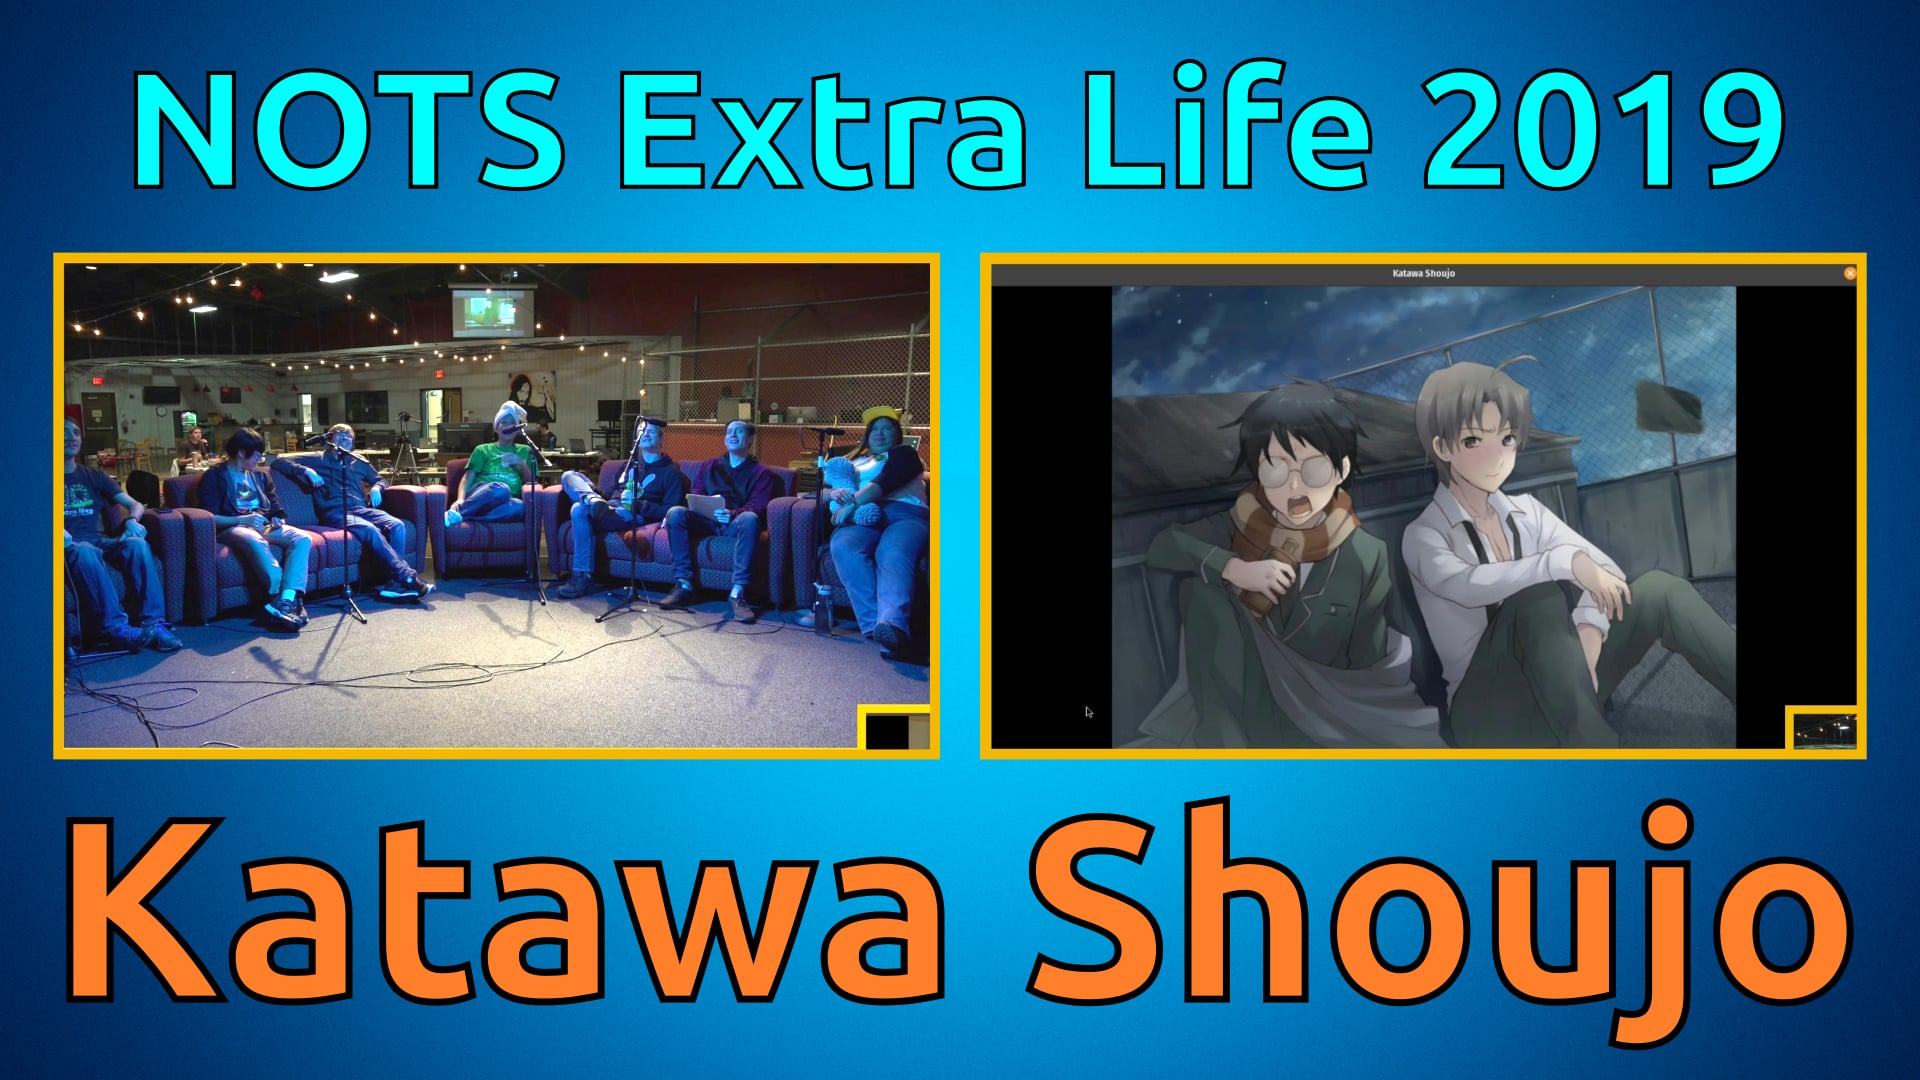 Katawa Shoujo (Kenji Ending) - Extra Life 2019